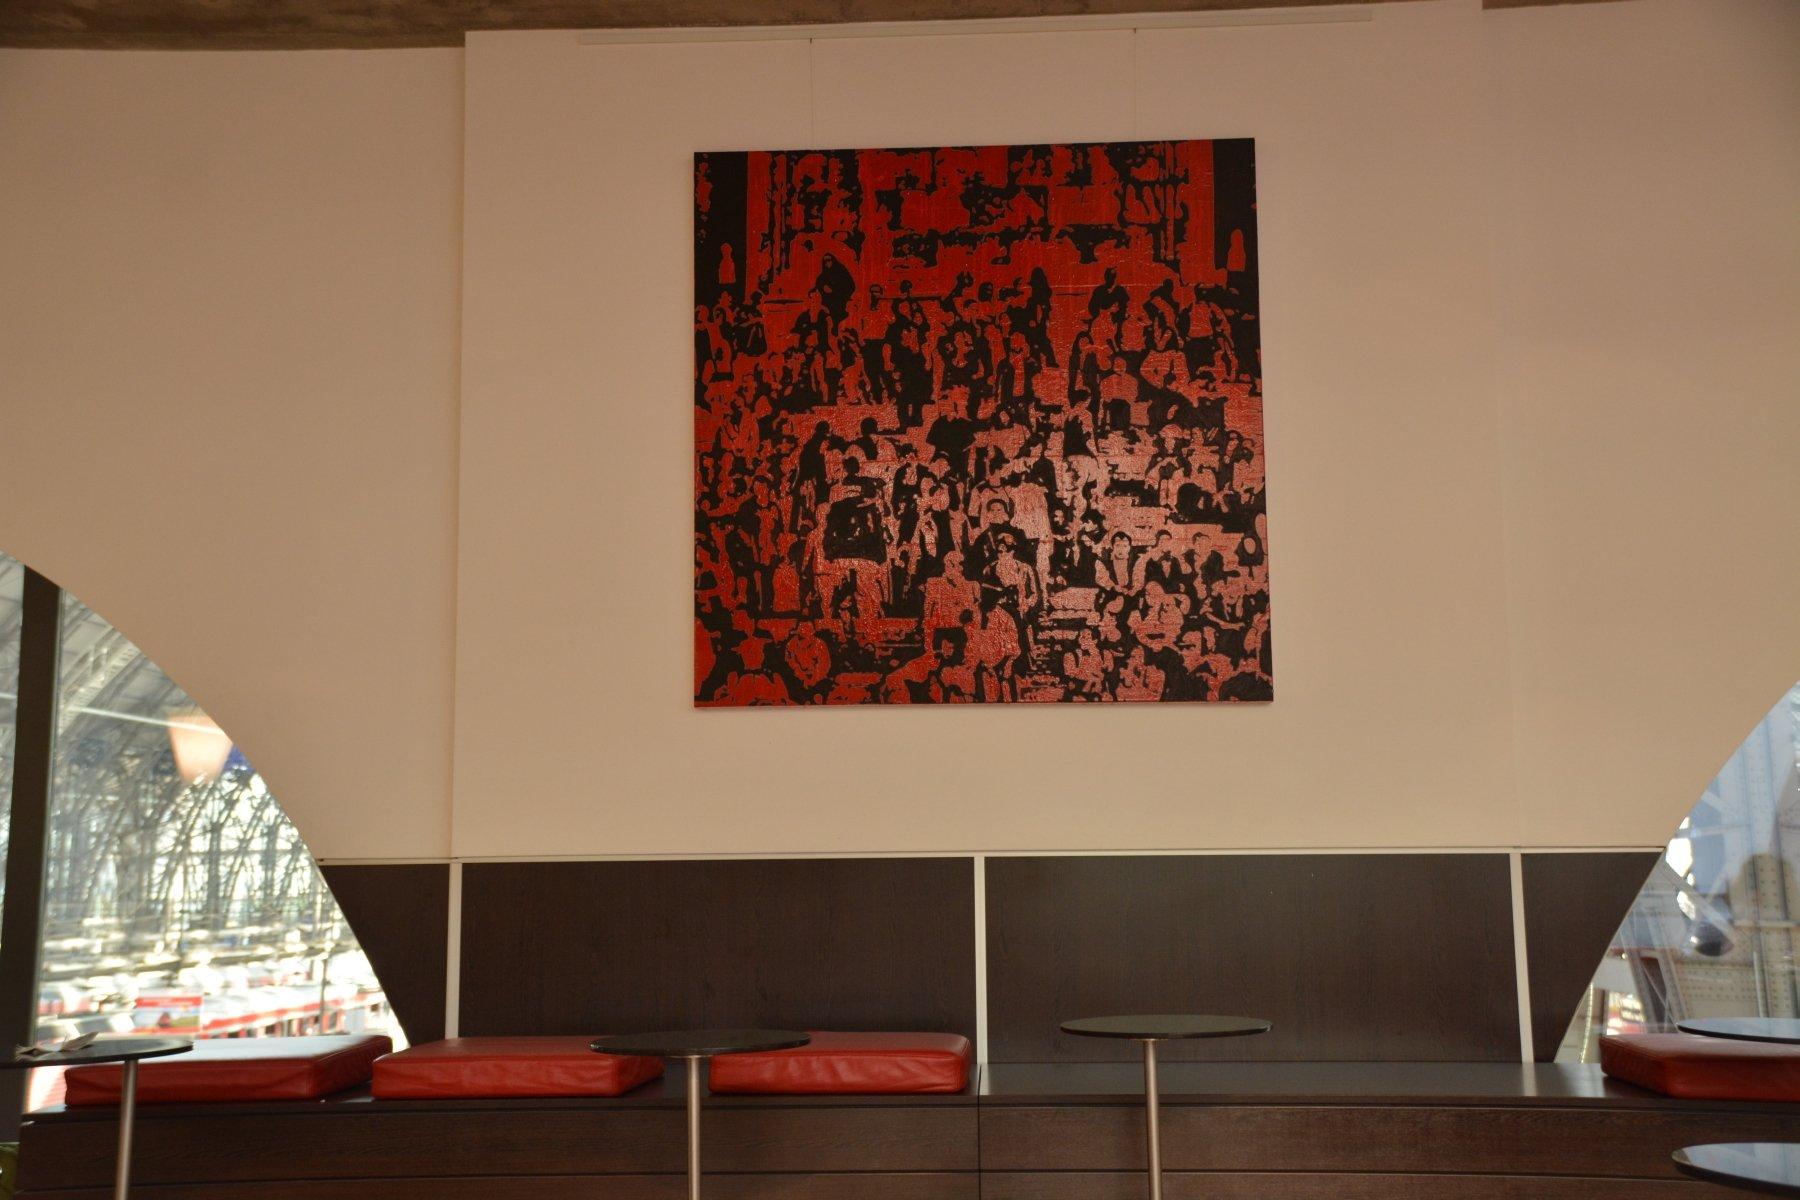 Kunst in der 1. KLasse DB Bahn Lounge in Frankfurt